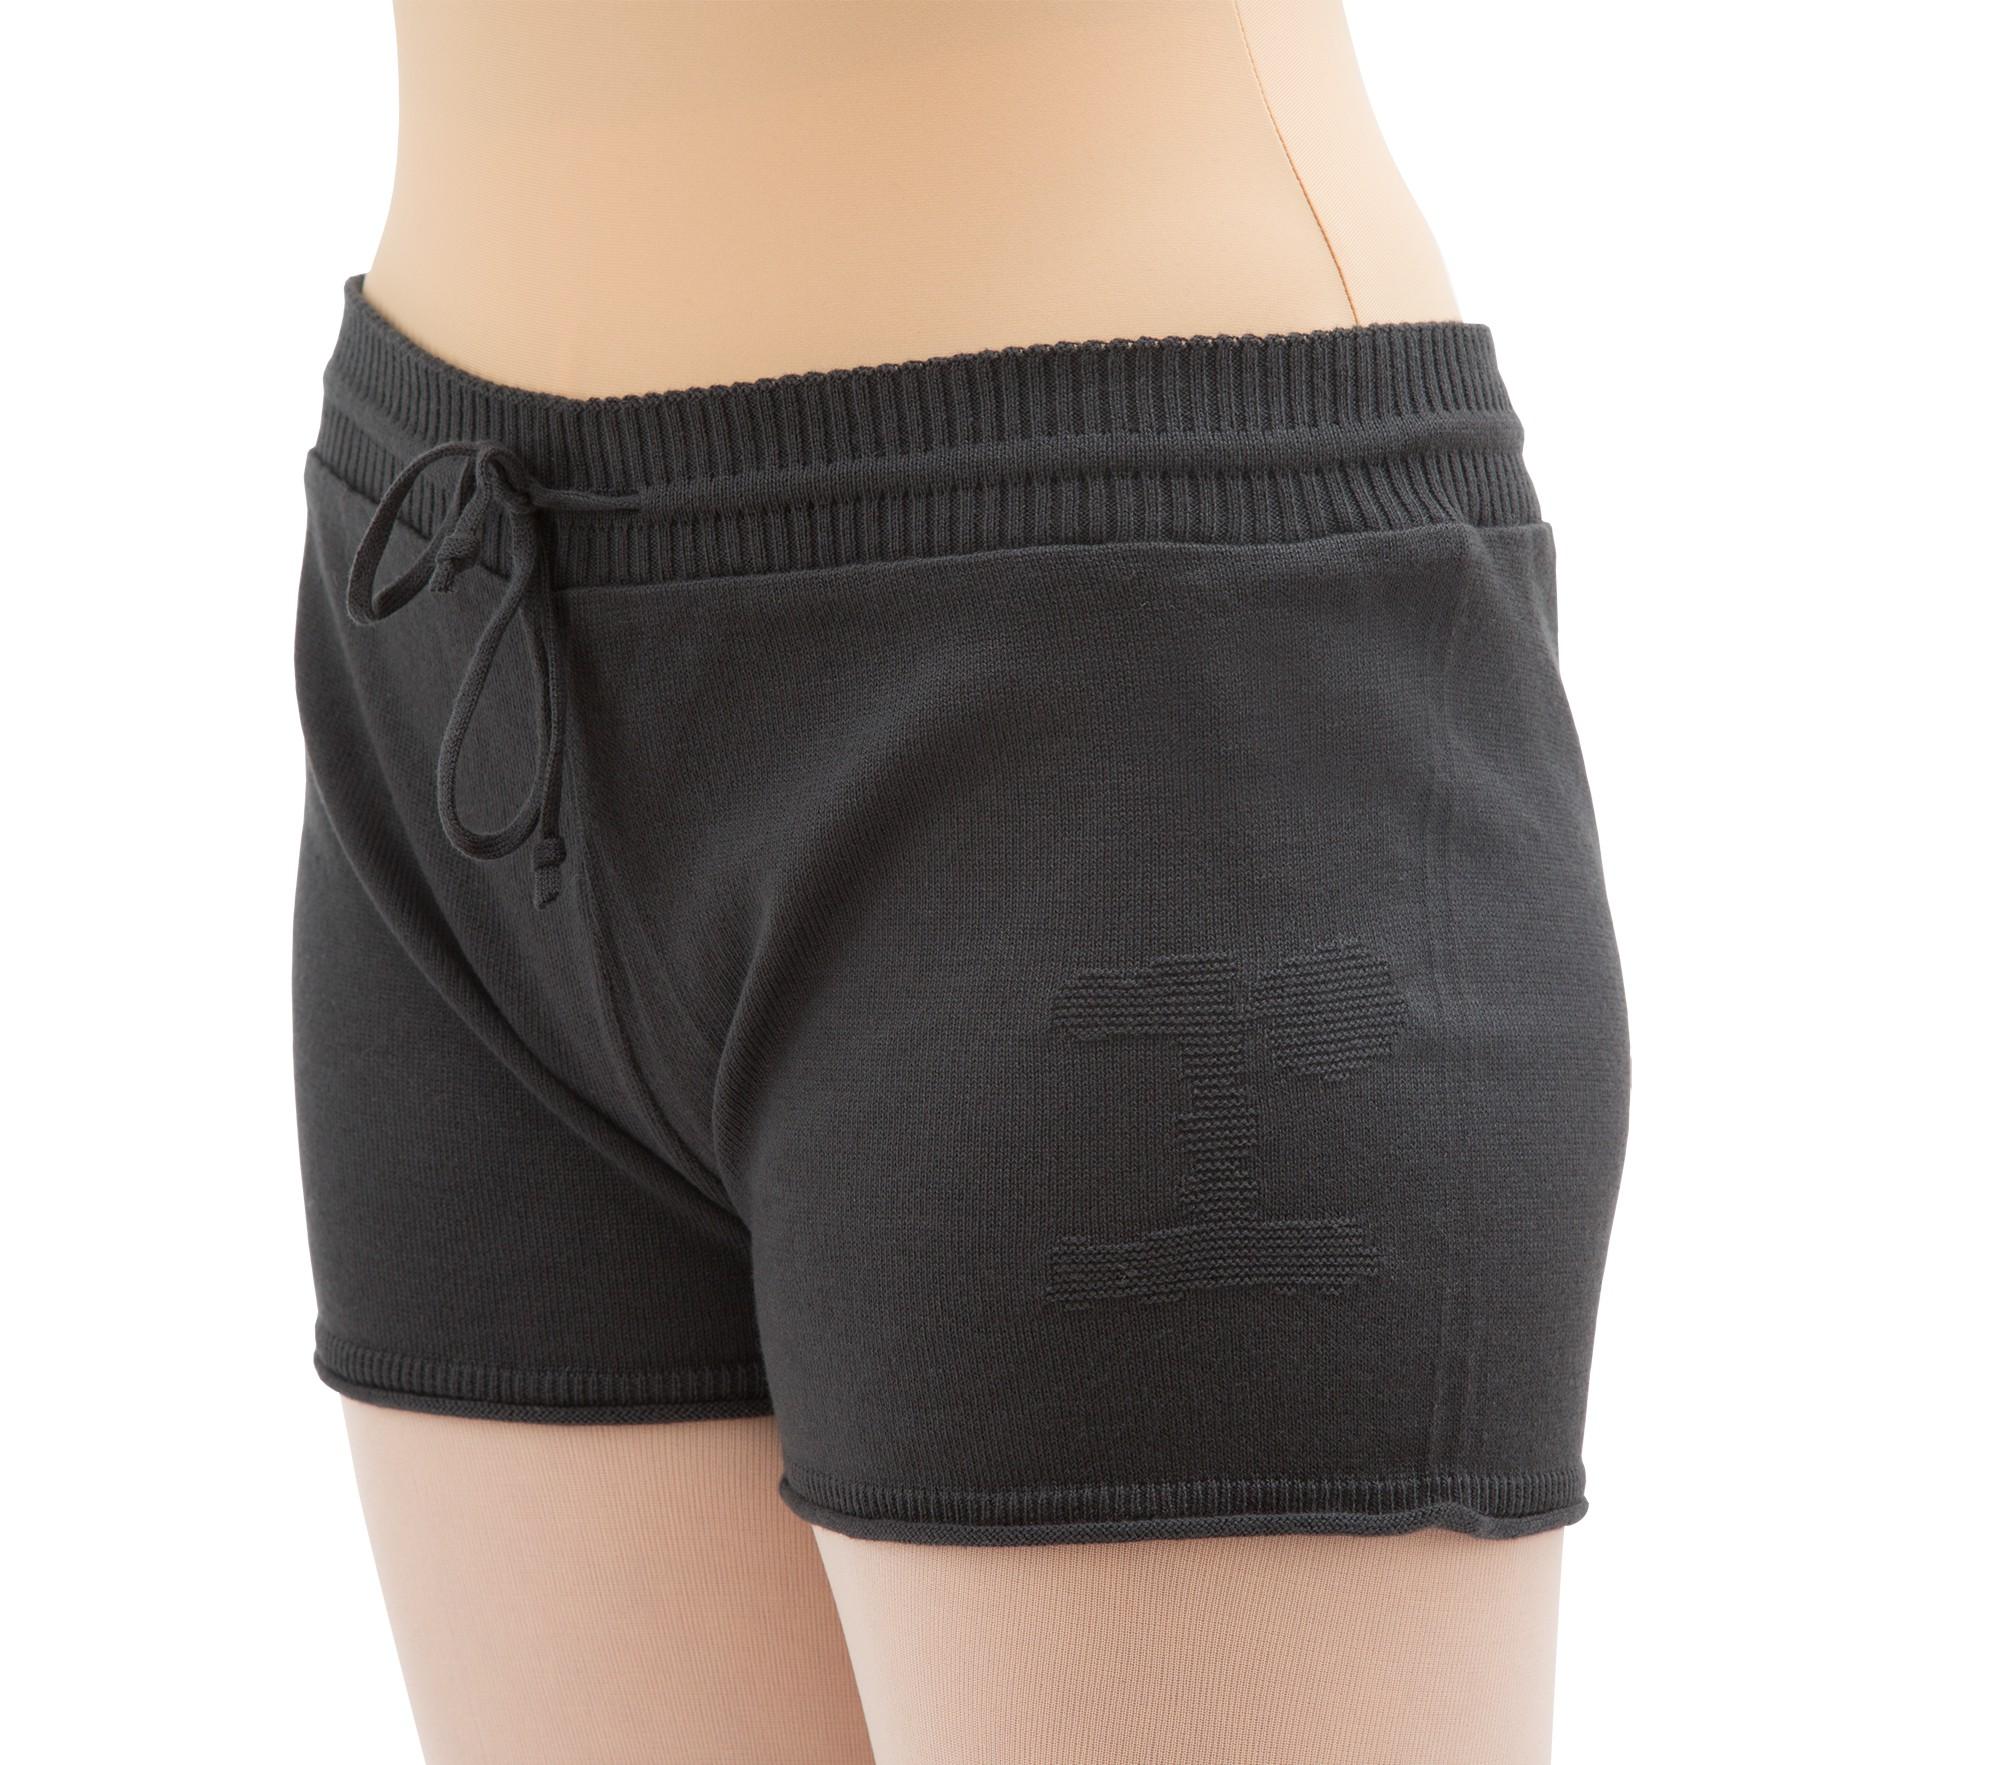 Shorts per riscaldamento